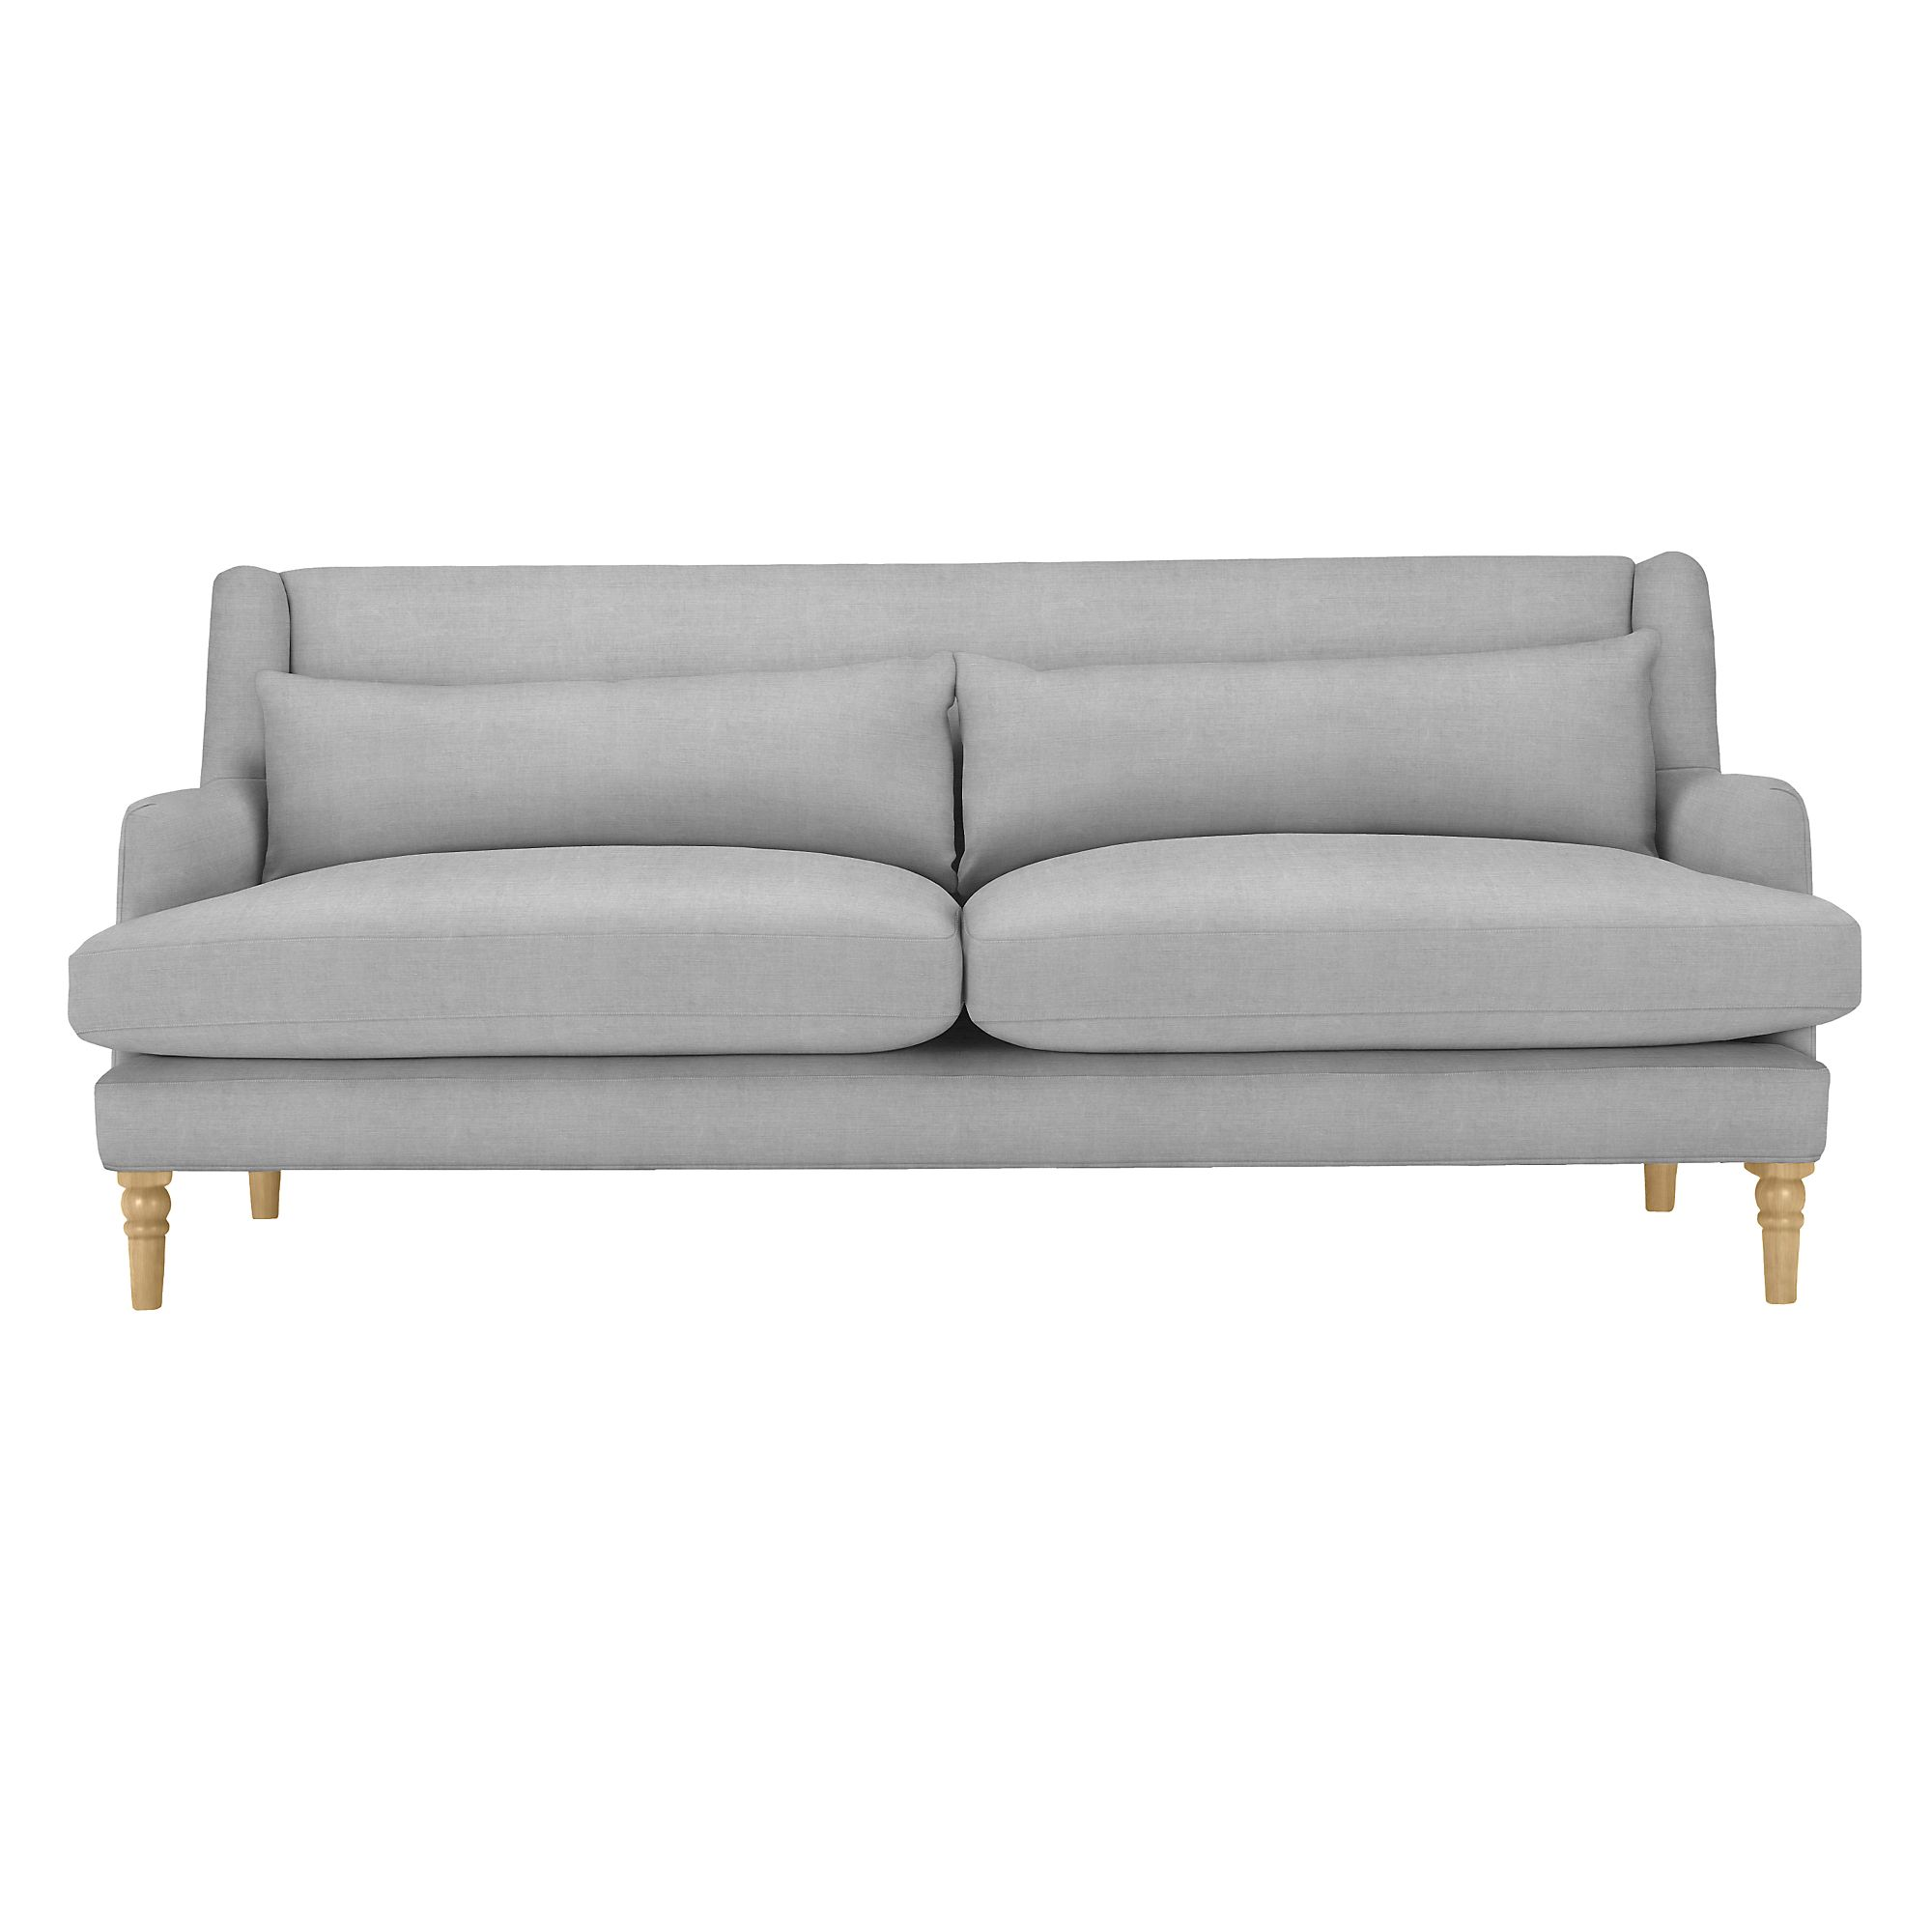 John Lewis Berwick Large Sofa